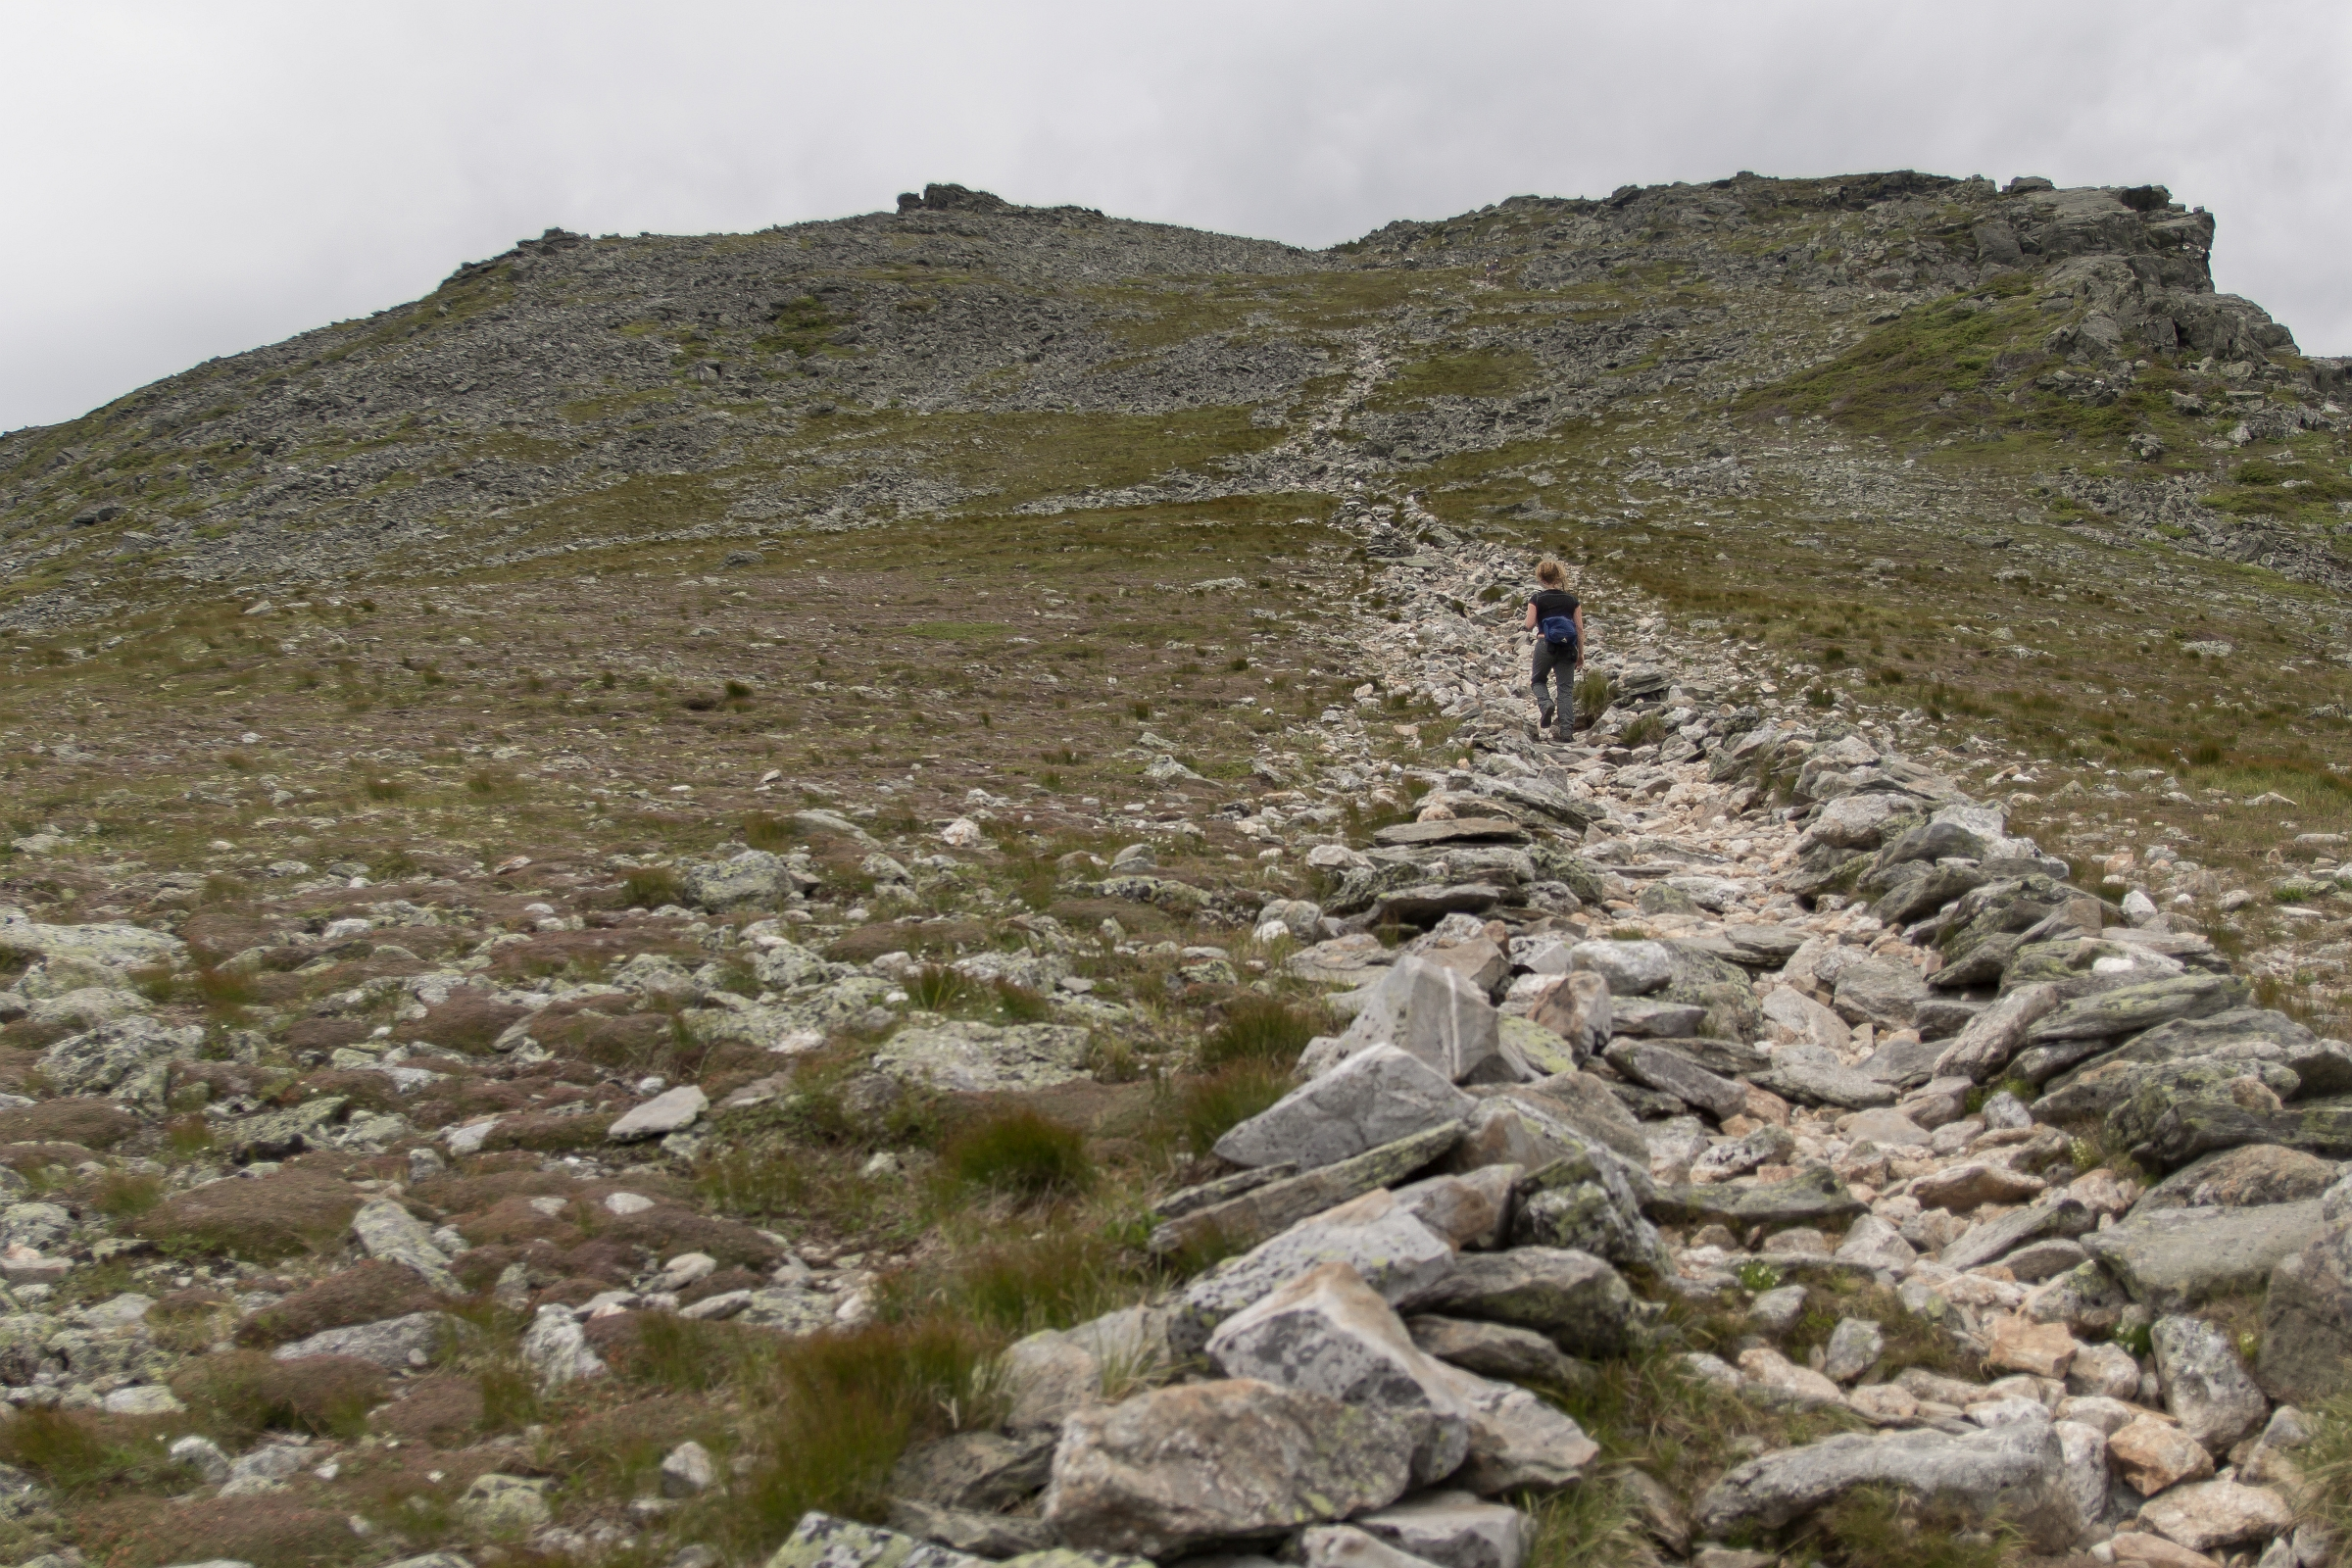 Ascending through the alpine up to Boott Spur Peak.